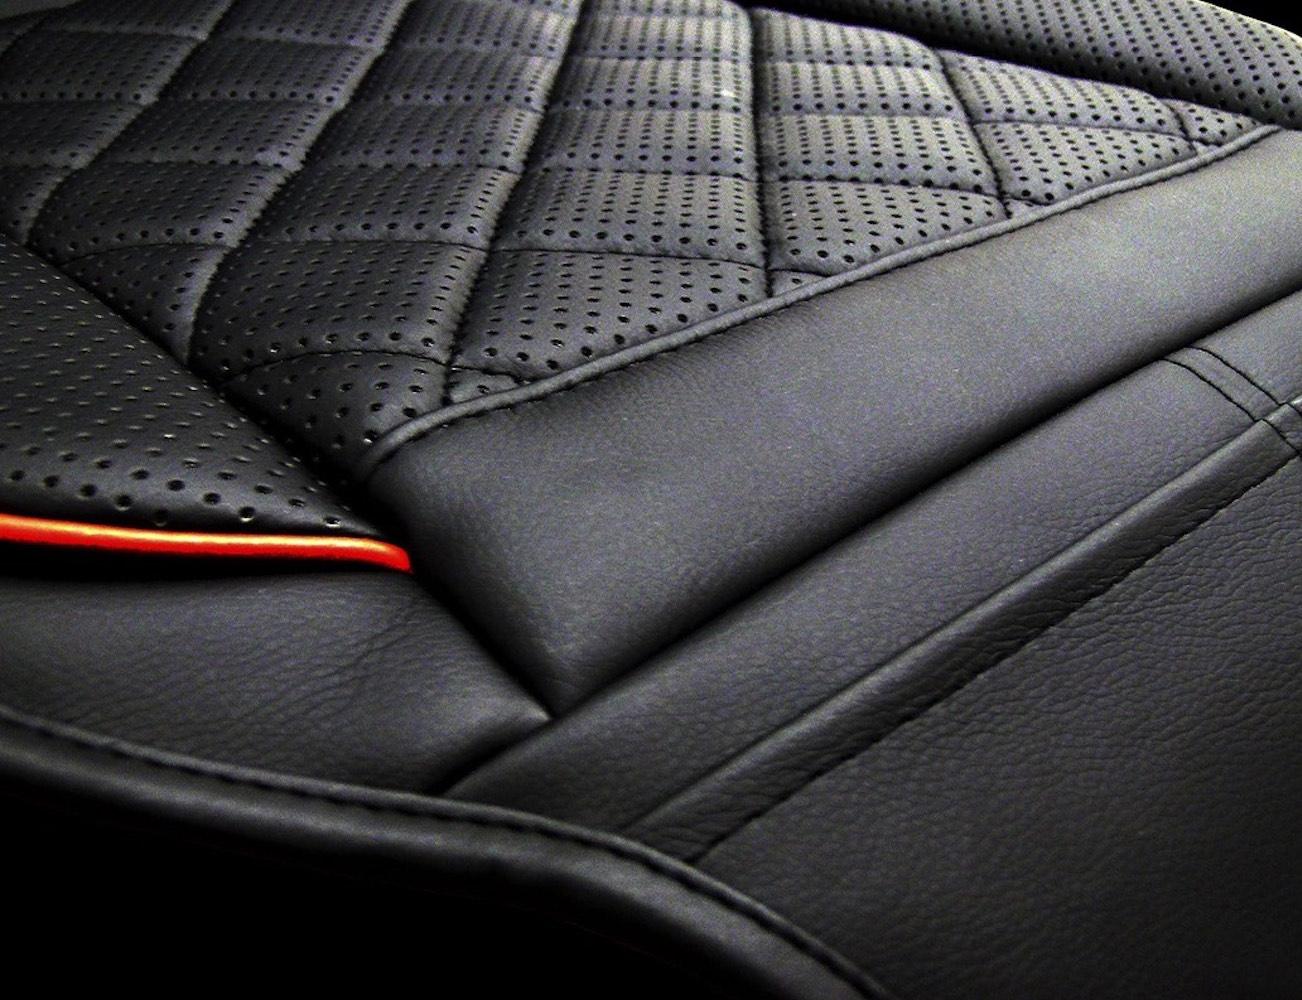 Viotek – Heating & Cooling Seat Cushion For Vehicles